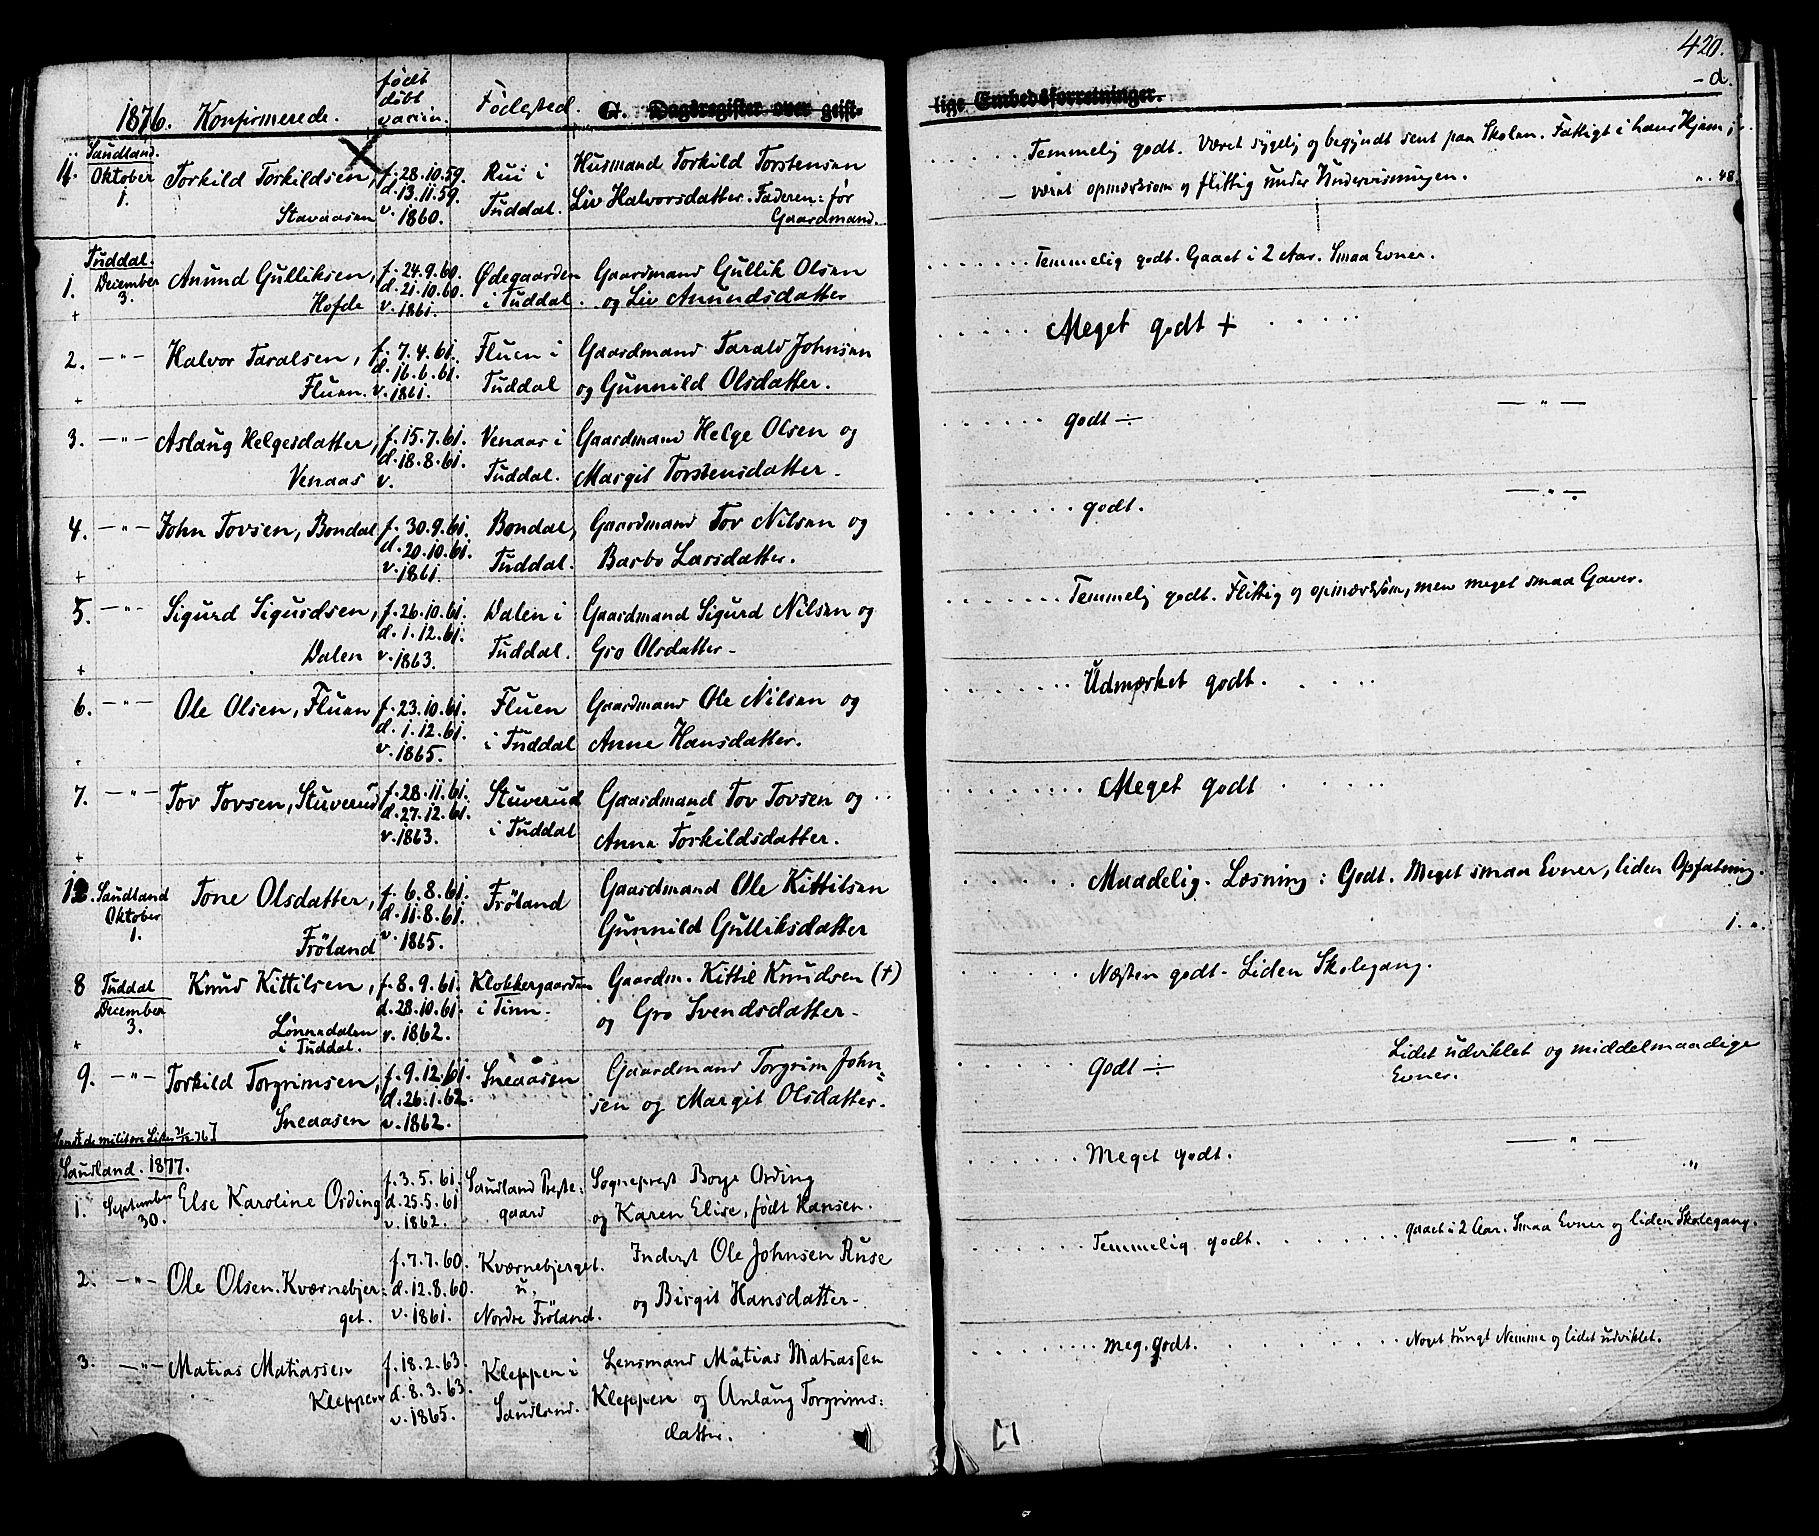 SAKO, Hjartdal kirkebøker, F/Fa/L0009: Ministerialbok nr. I 9, 1860-1879, s. 420